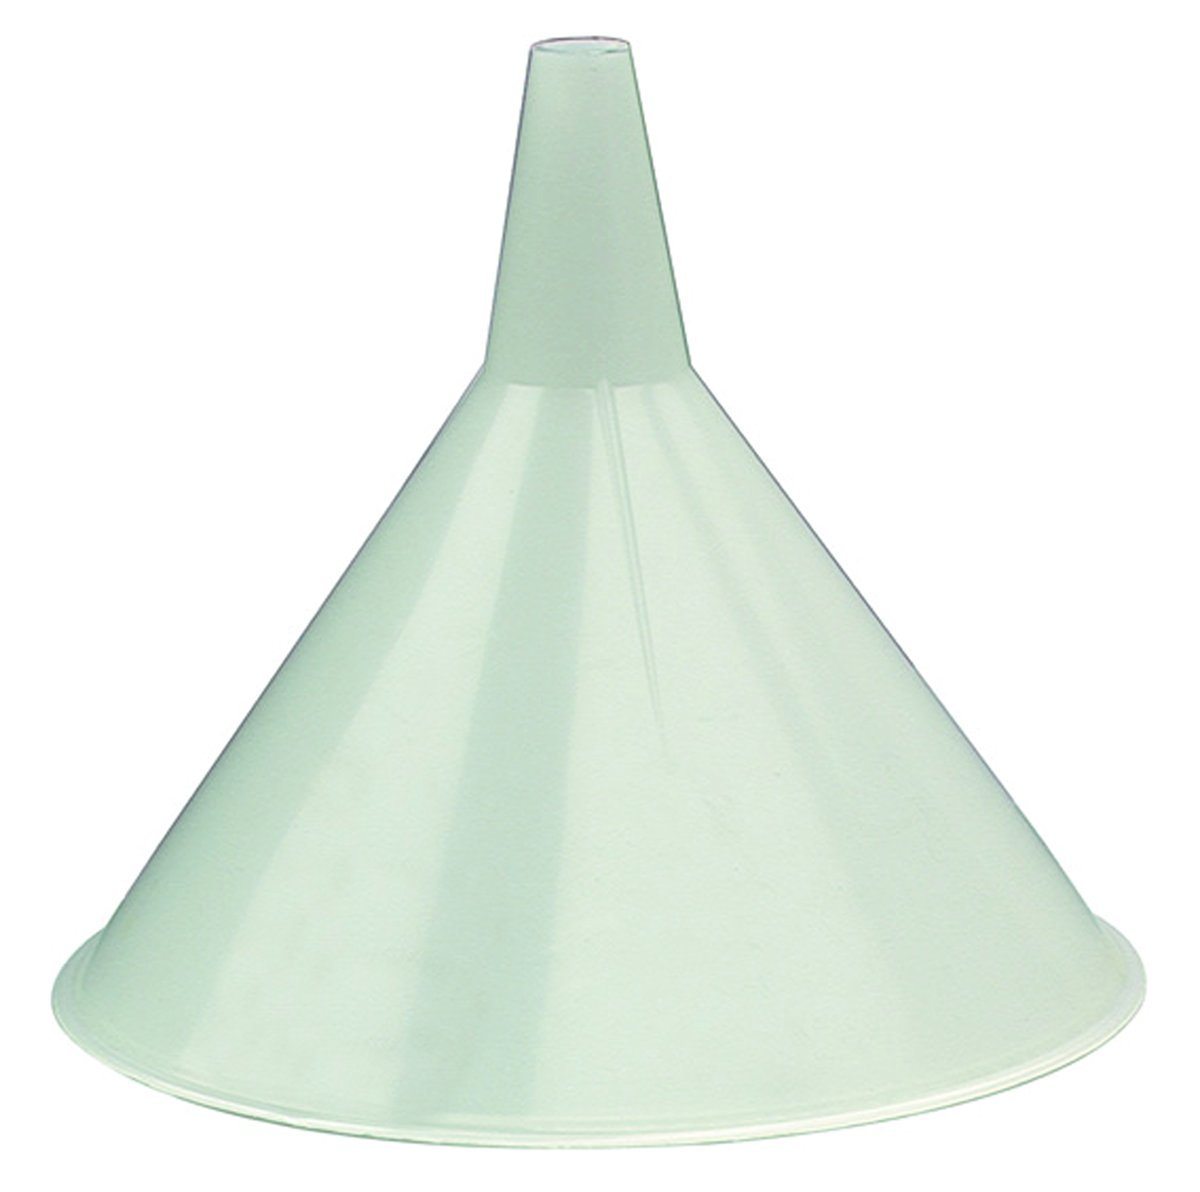 Plews 75-064 Plastic Economy Utility Funnel - 48 oz. Capacity